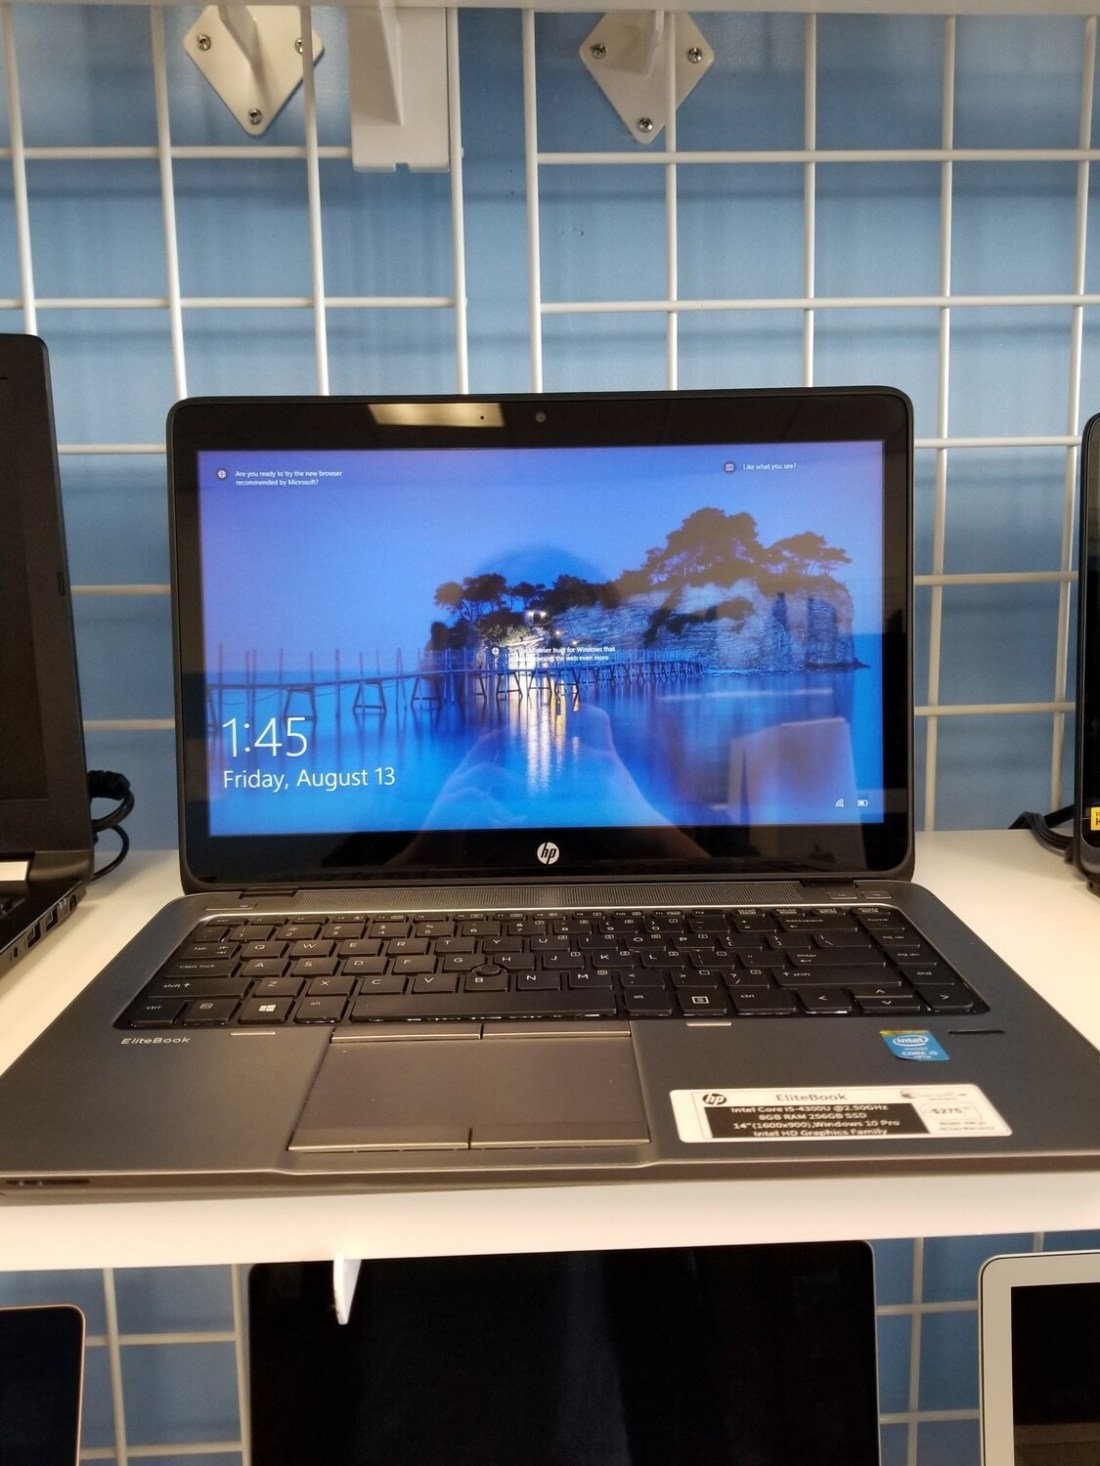 EliteBook Intel Core i5-4300U @2.50GHz 8GB Ram 256GB SSD 14